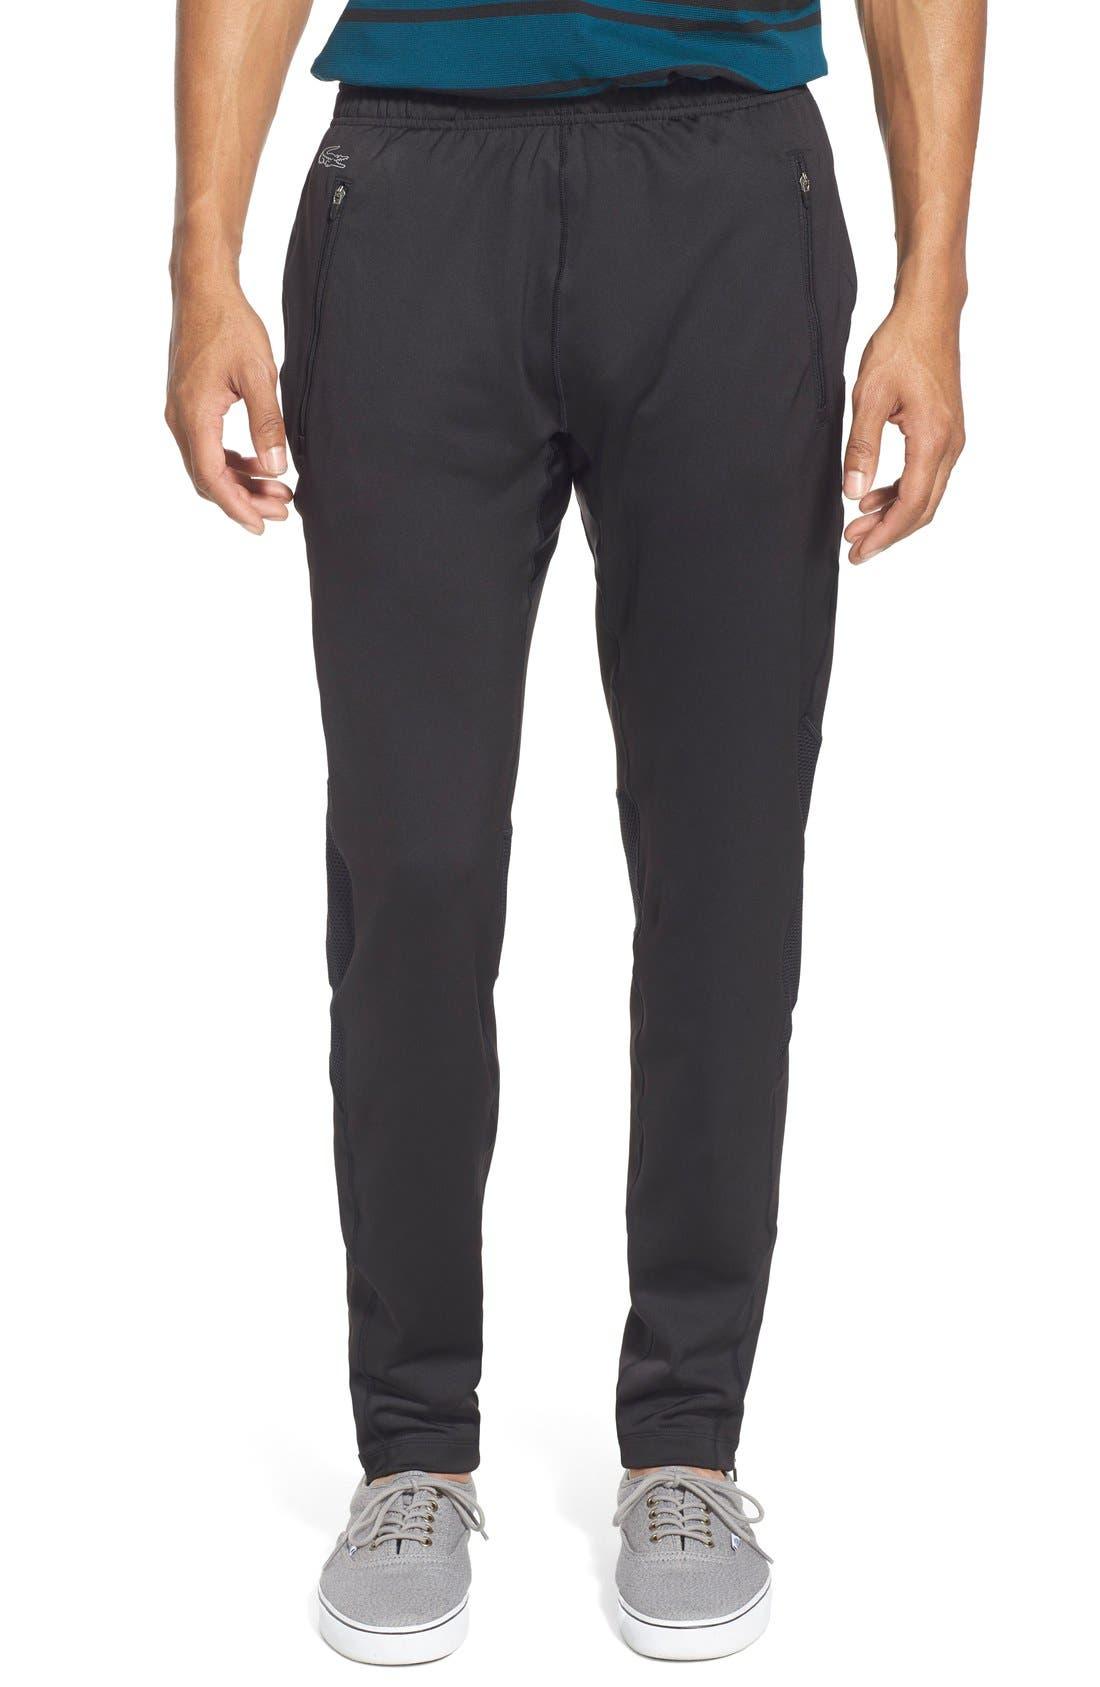 'Sport' Ultra Dry Stretch Performance Track Pants,                             Main thumbnail 1, color,                             Black